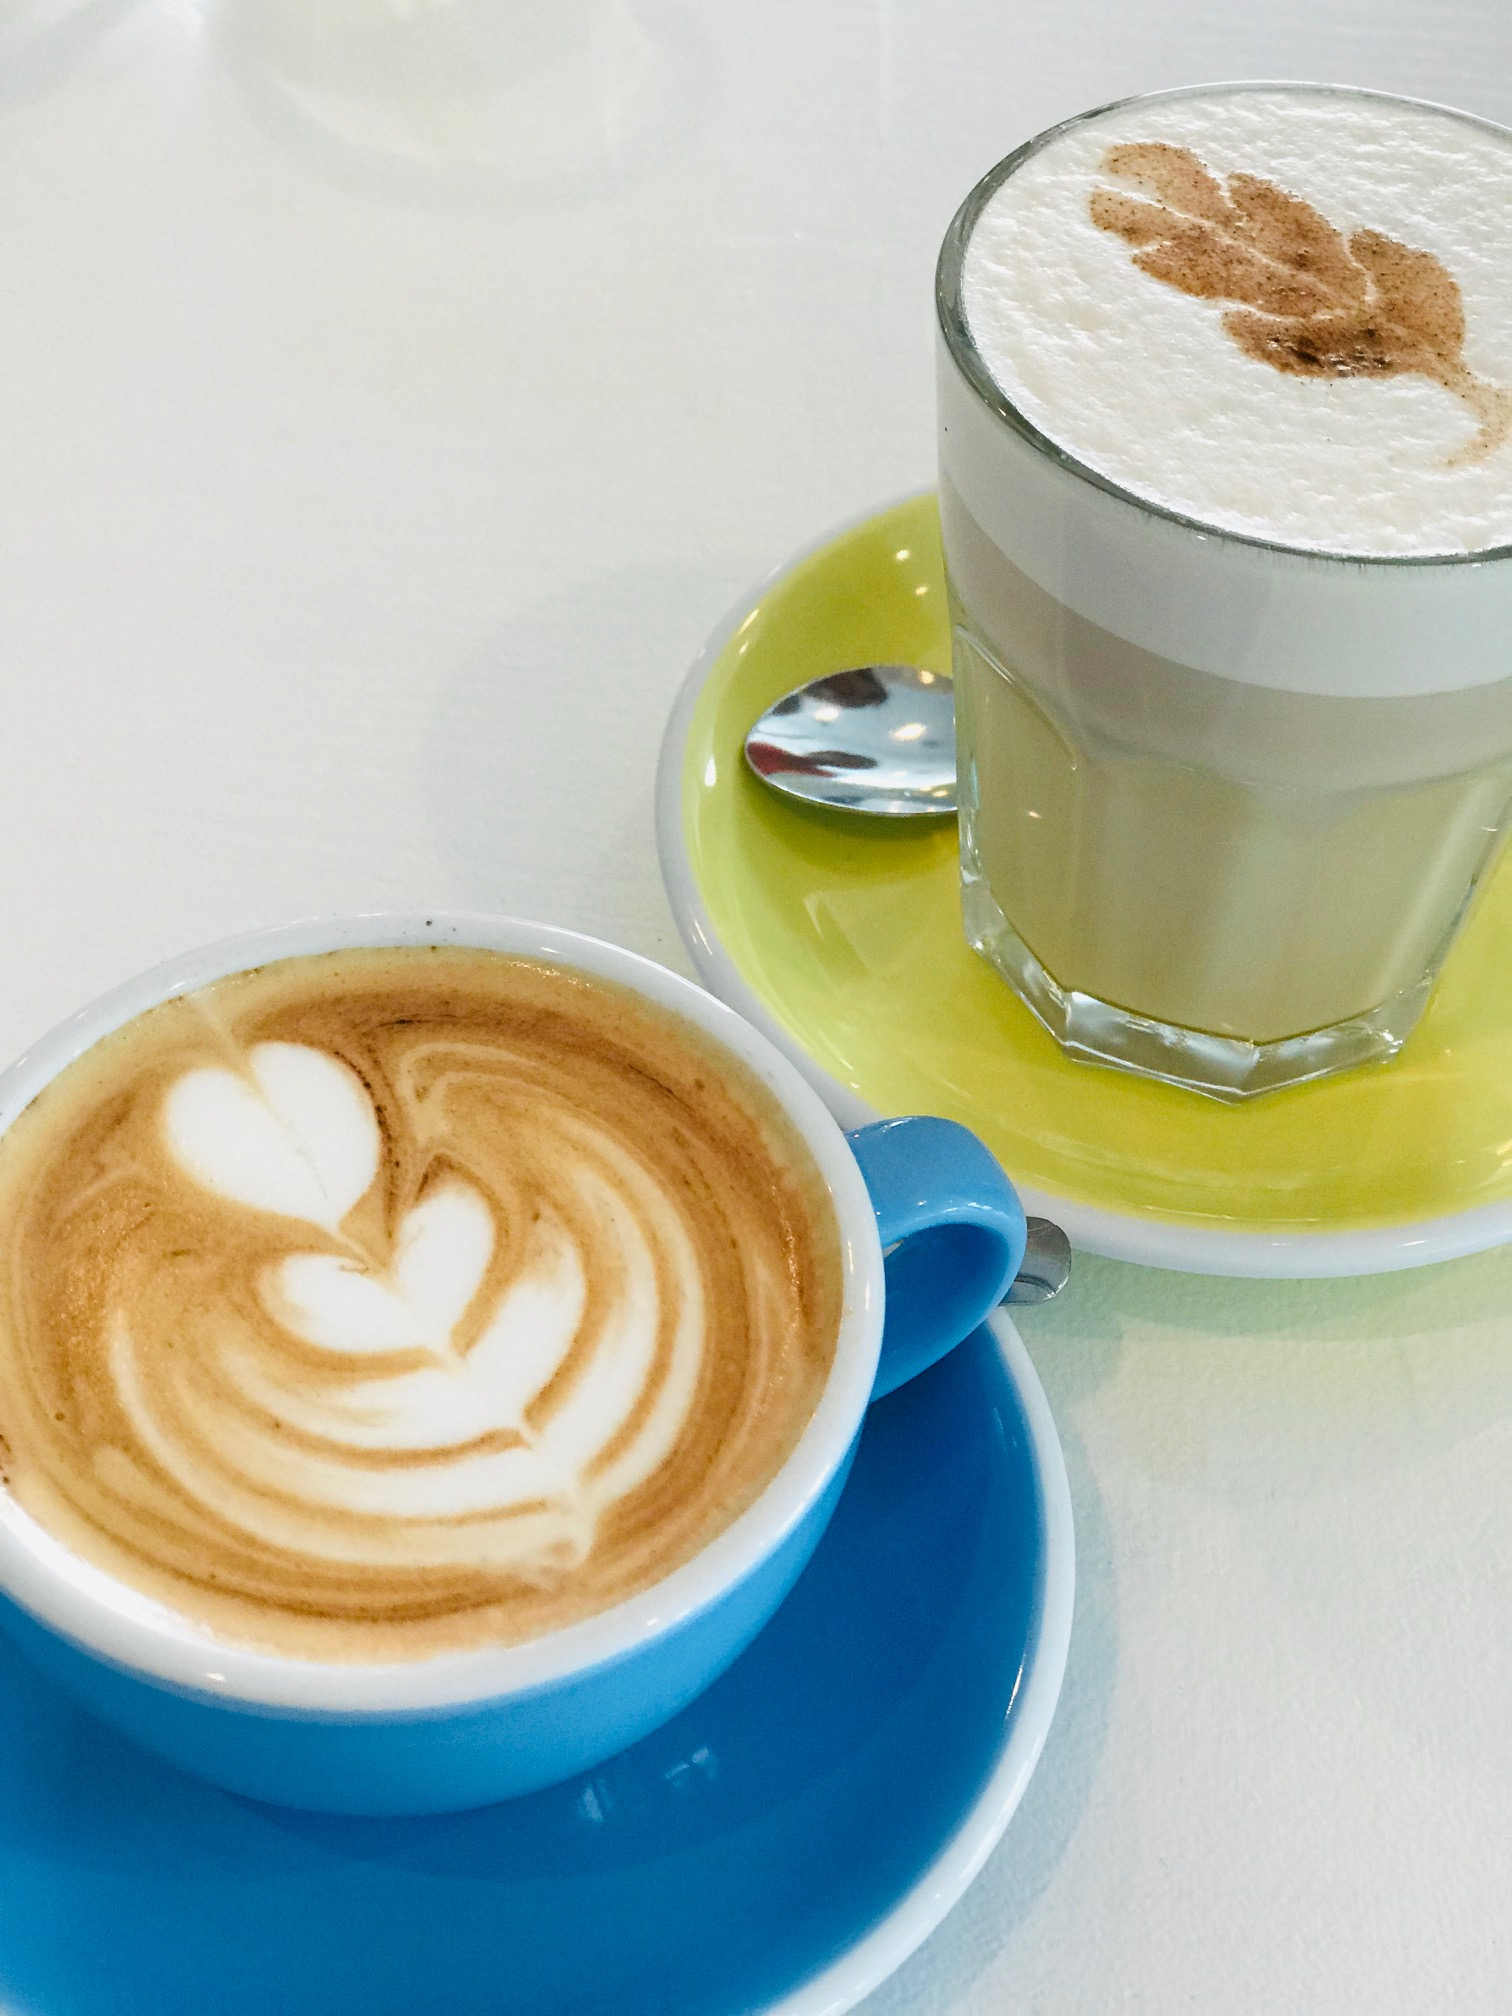 deco coffee co latte.jpg